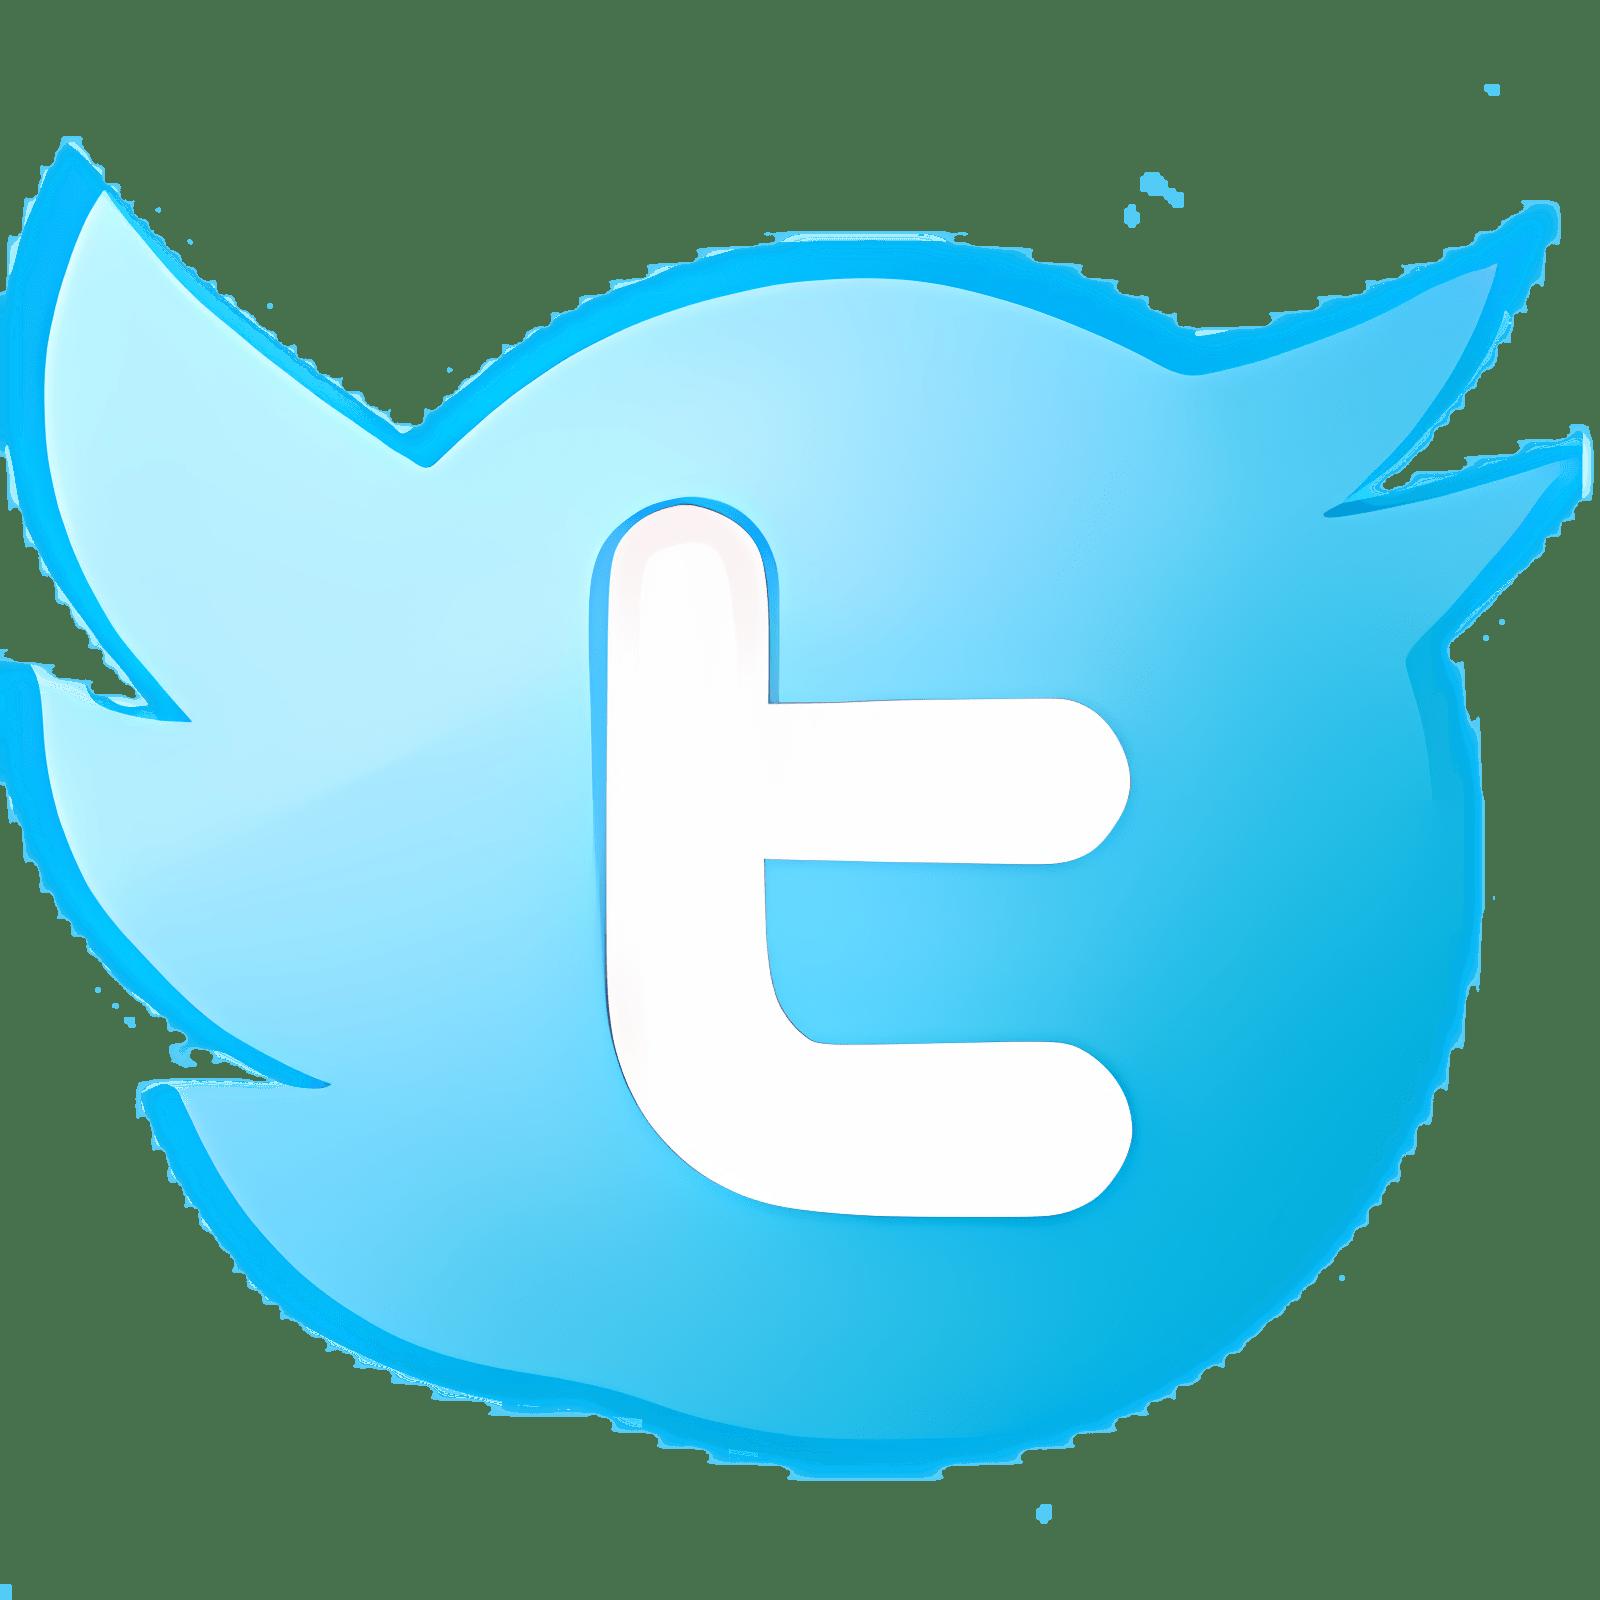 Twitter @ Desktop